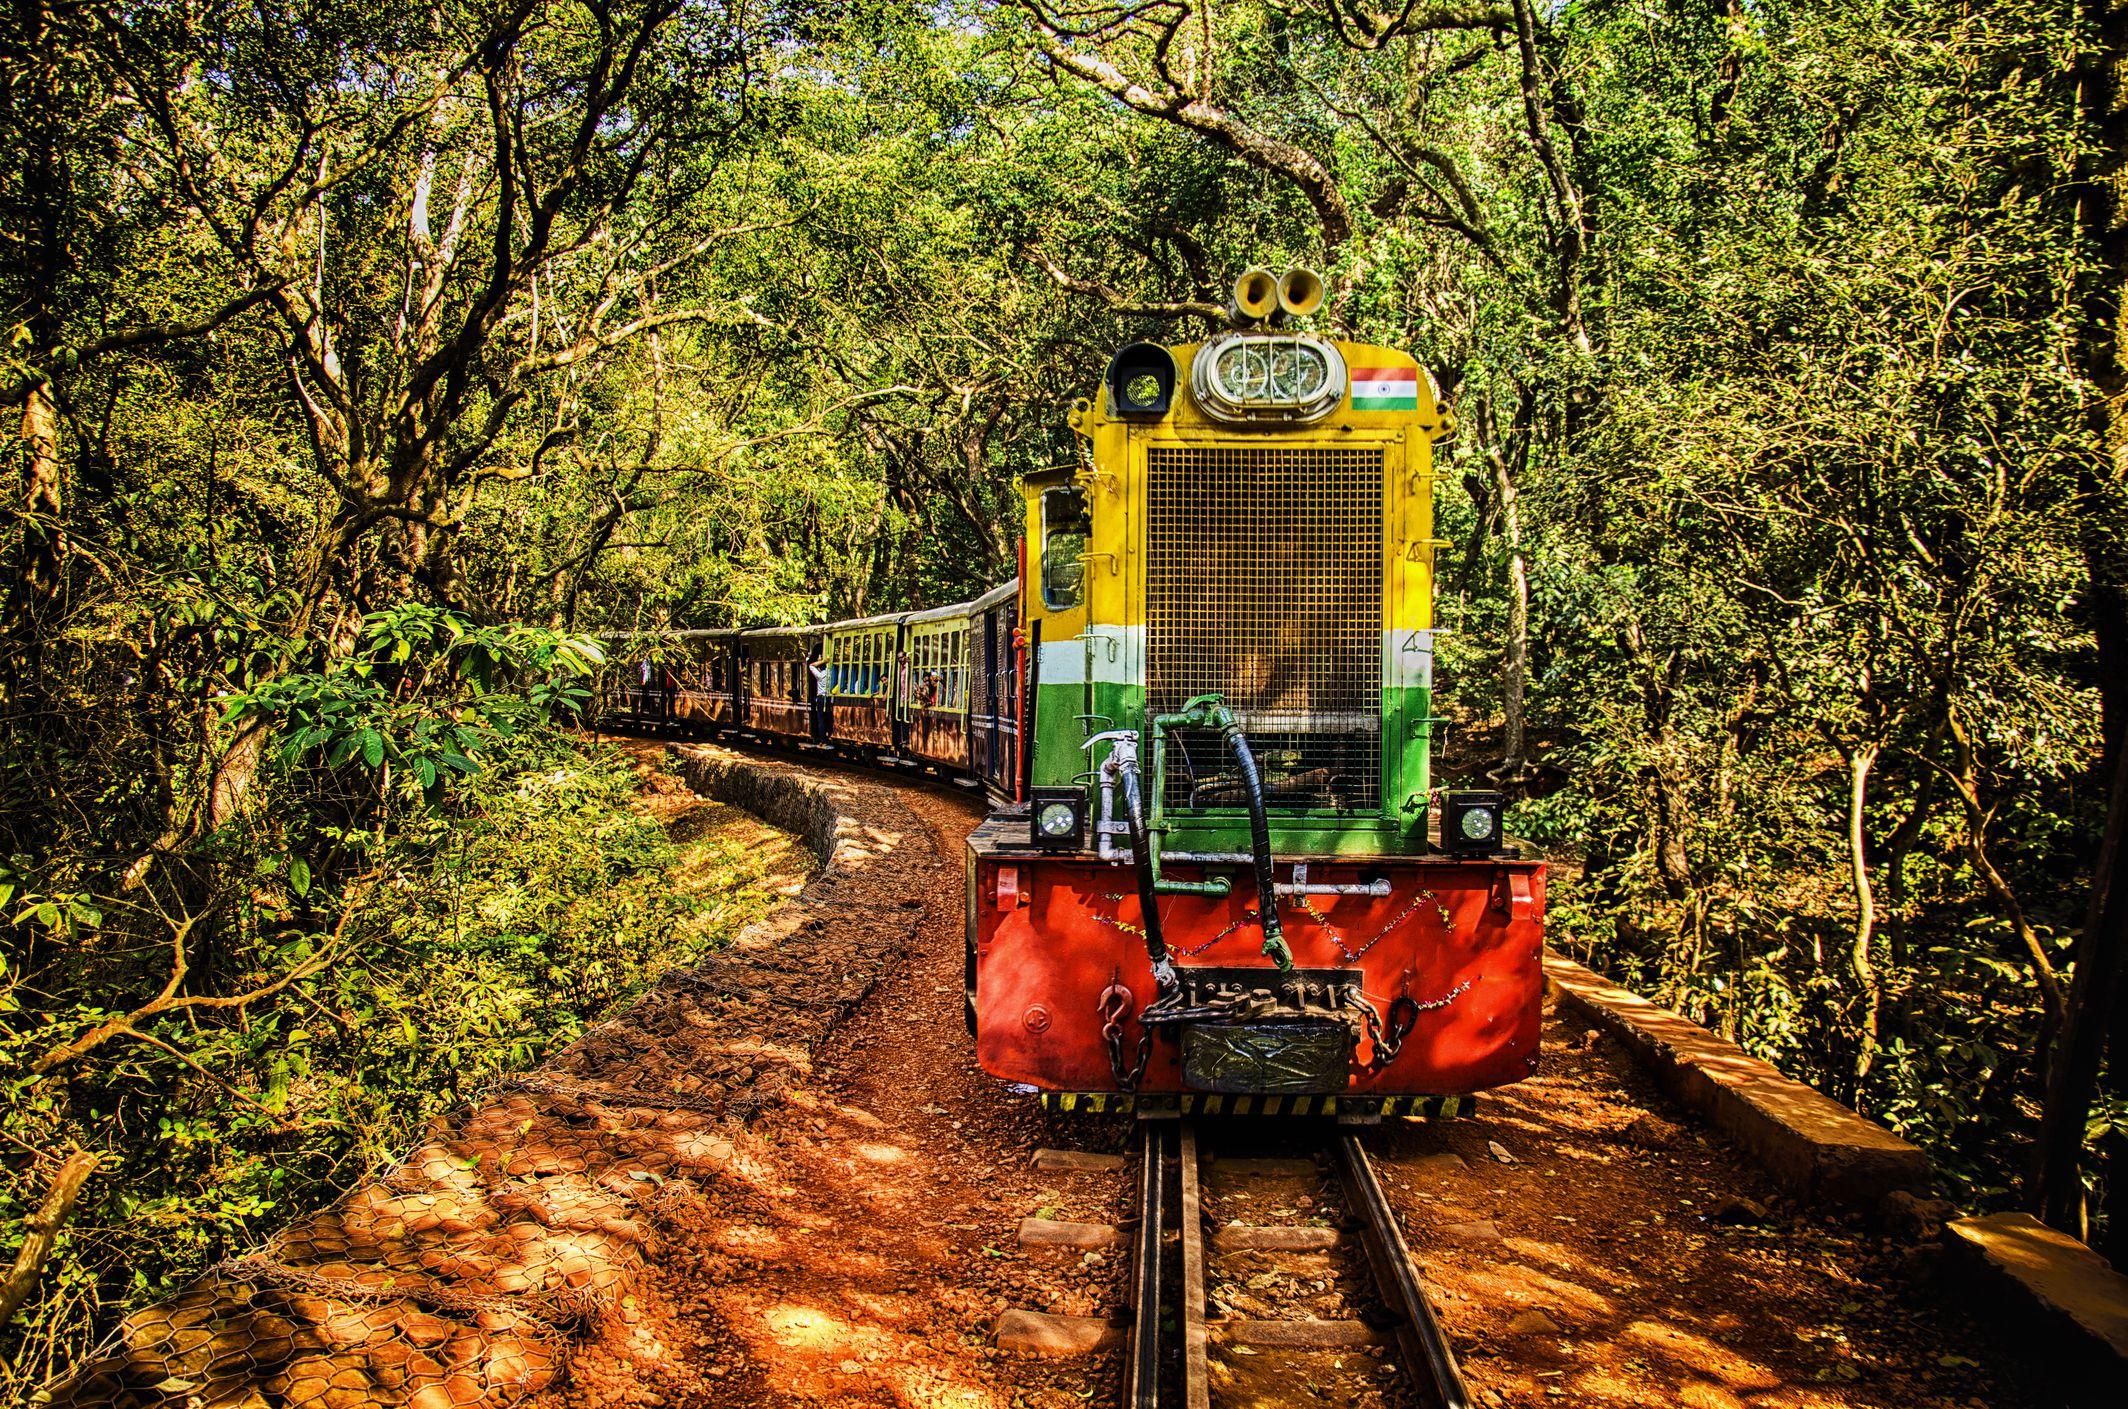 Matheran Hill Railway Toy Train: Essential Travel Guide